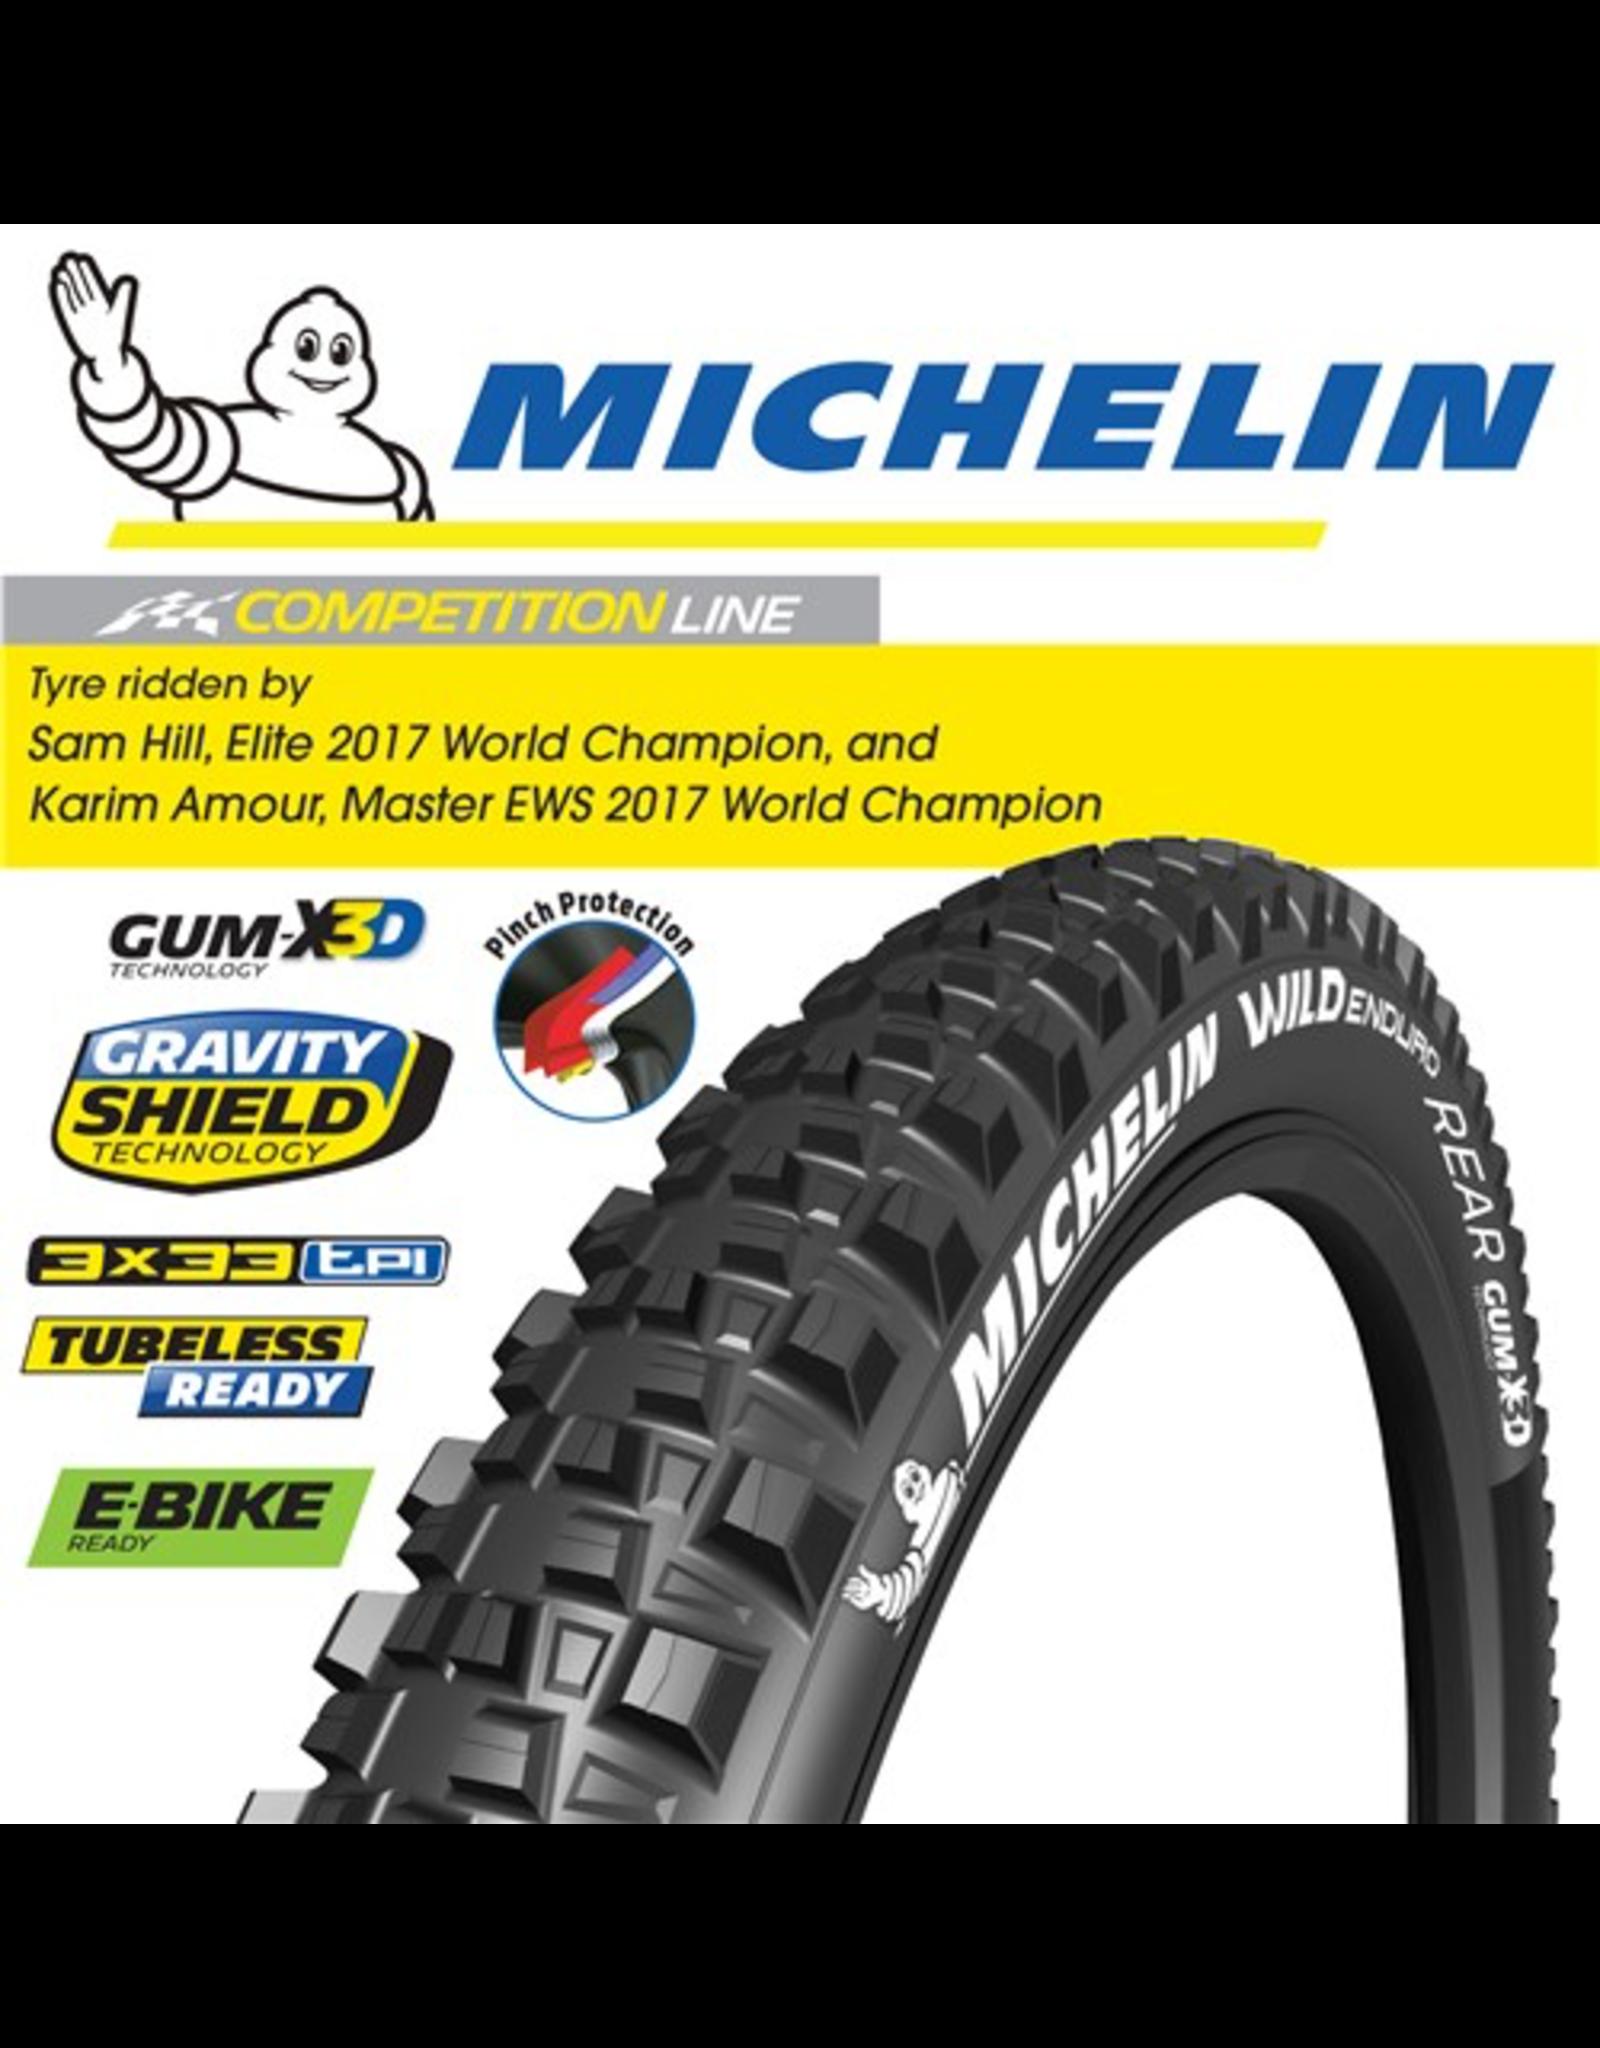 "MICHELIN MICHELIN WILD ENDURO R COMPETITION GUM-X3D 27.5x2.4"" FOLDTYRE"